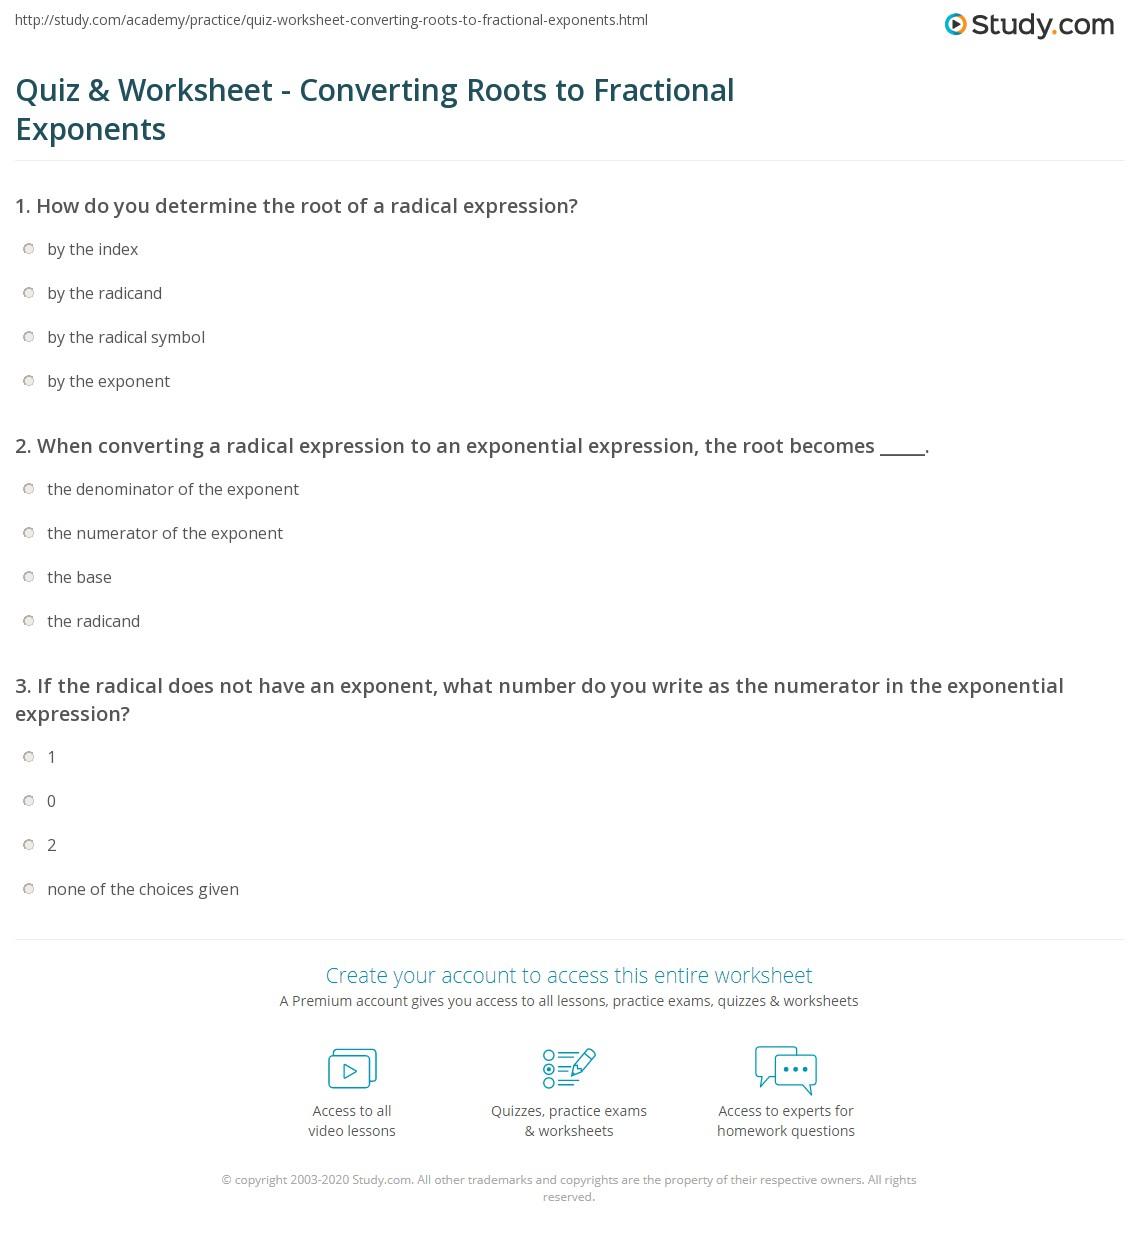 Worksheets Fractional Exponents Worksheet quiz worksheet converting roots to fractional exponents study com print how convert worksheet